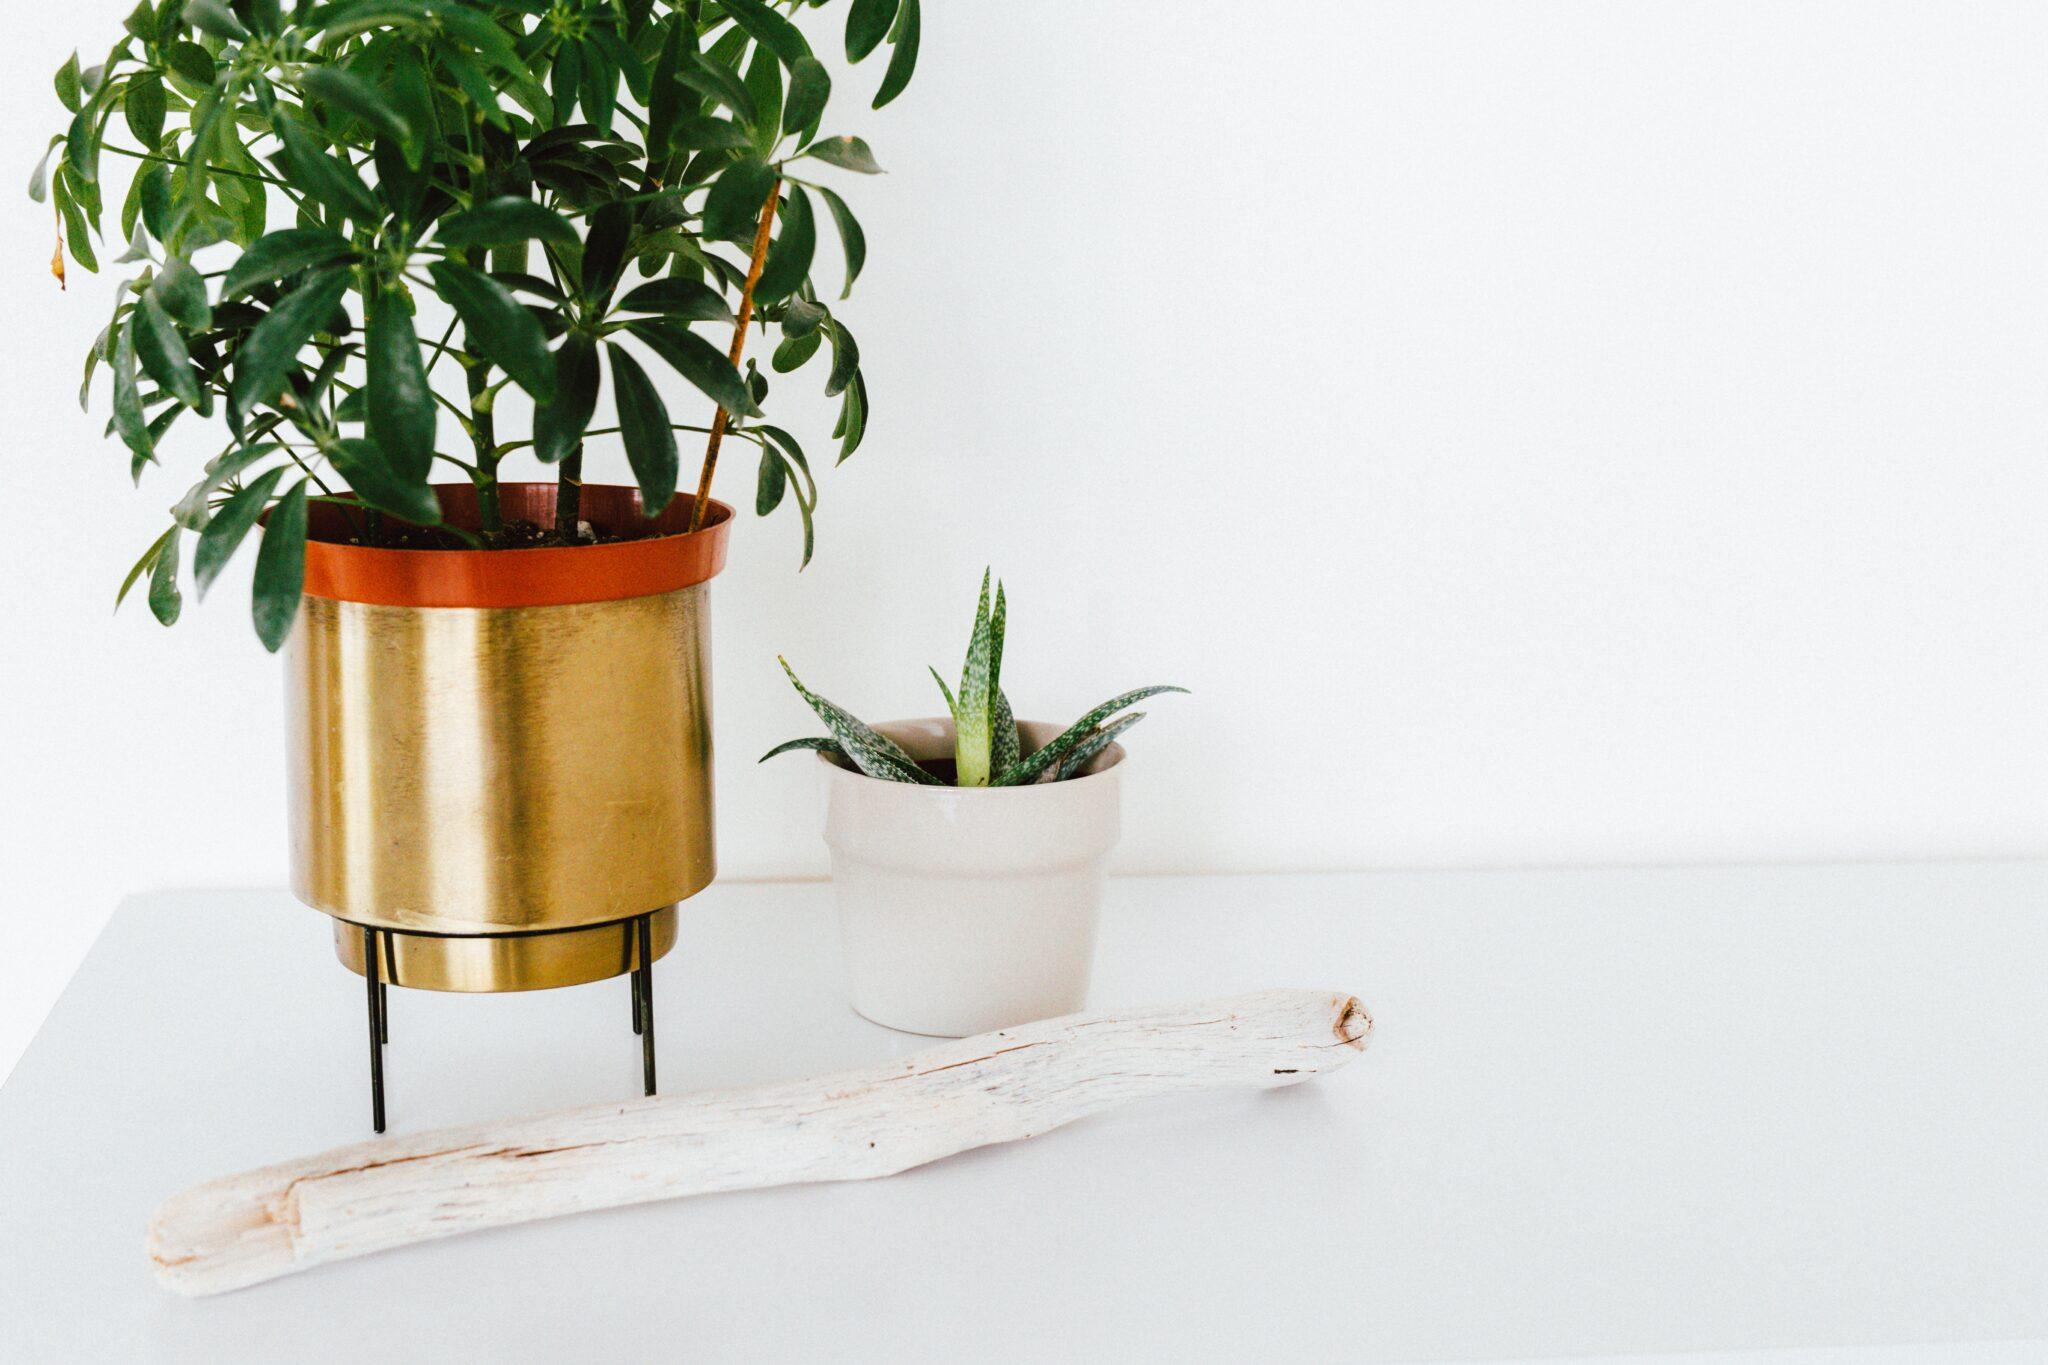 plants on desk